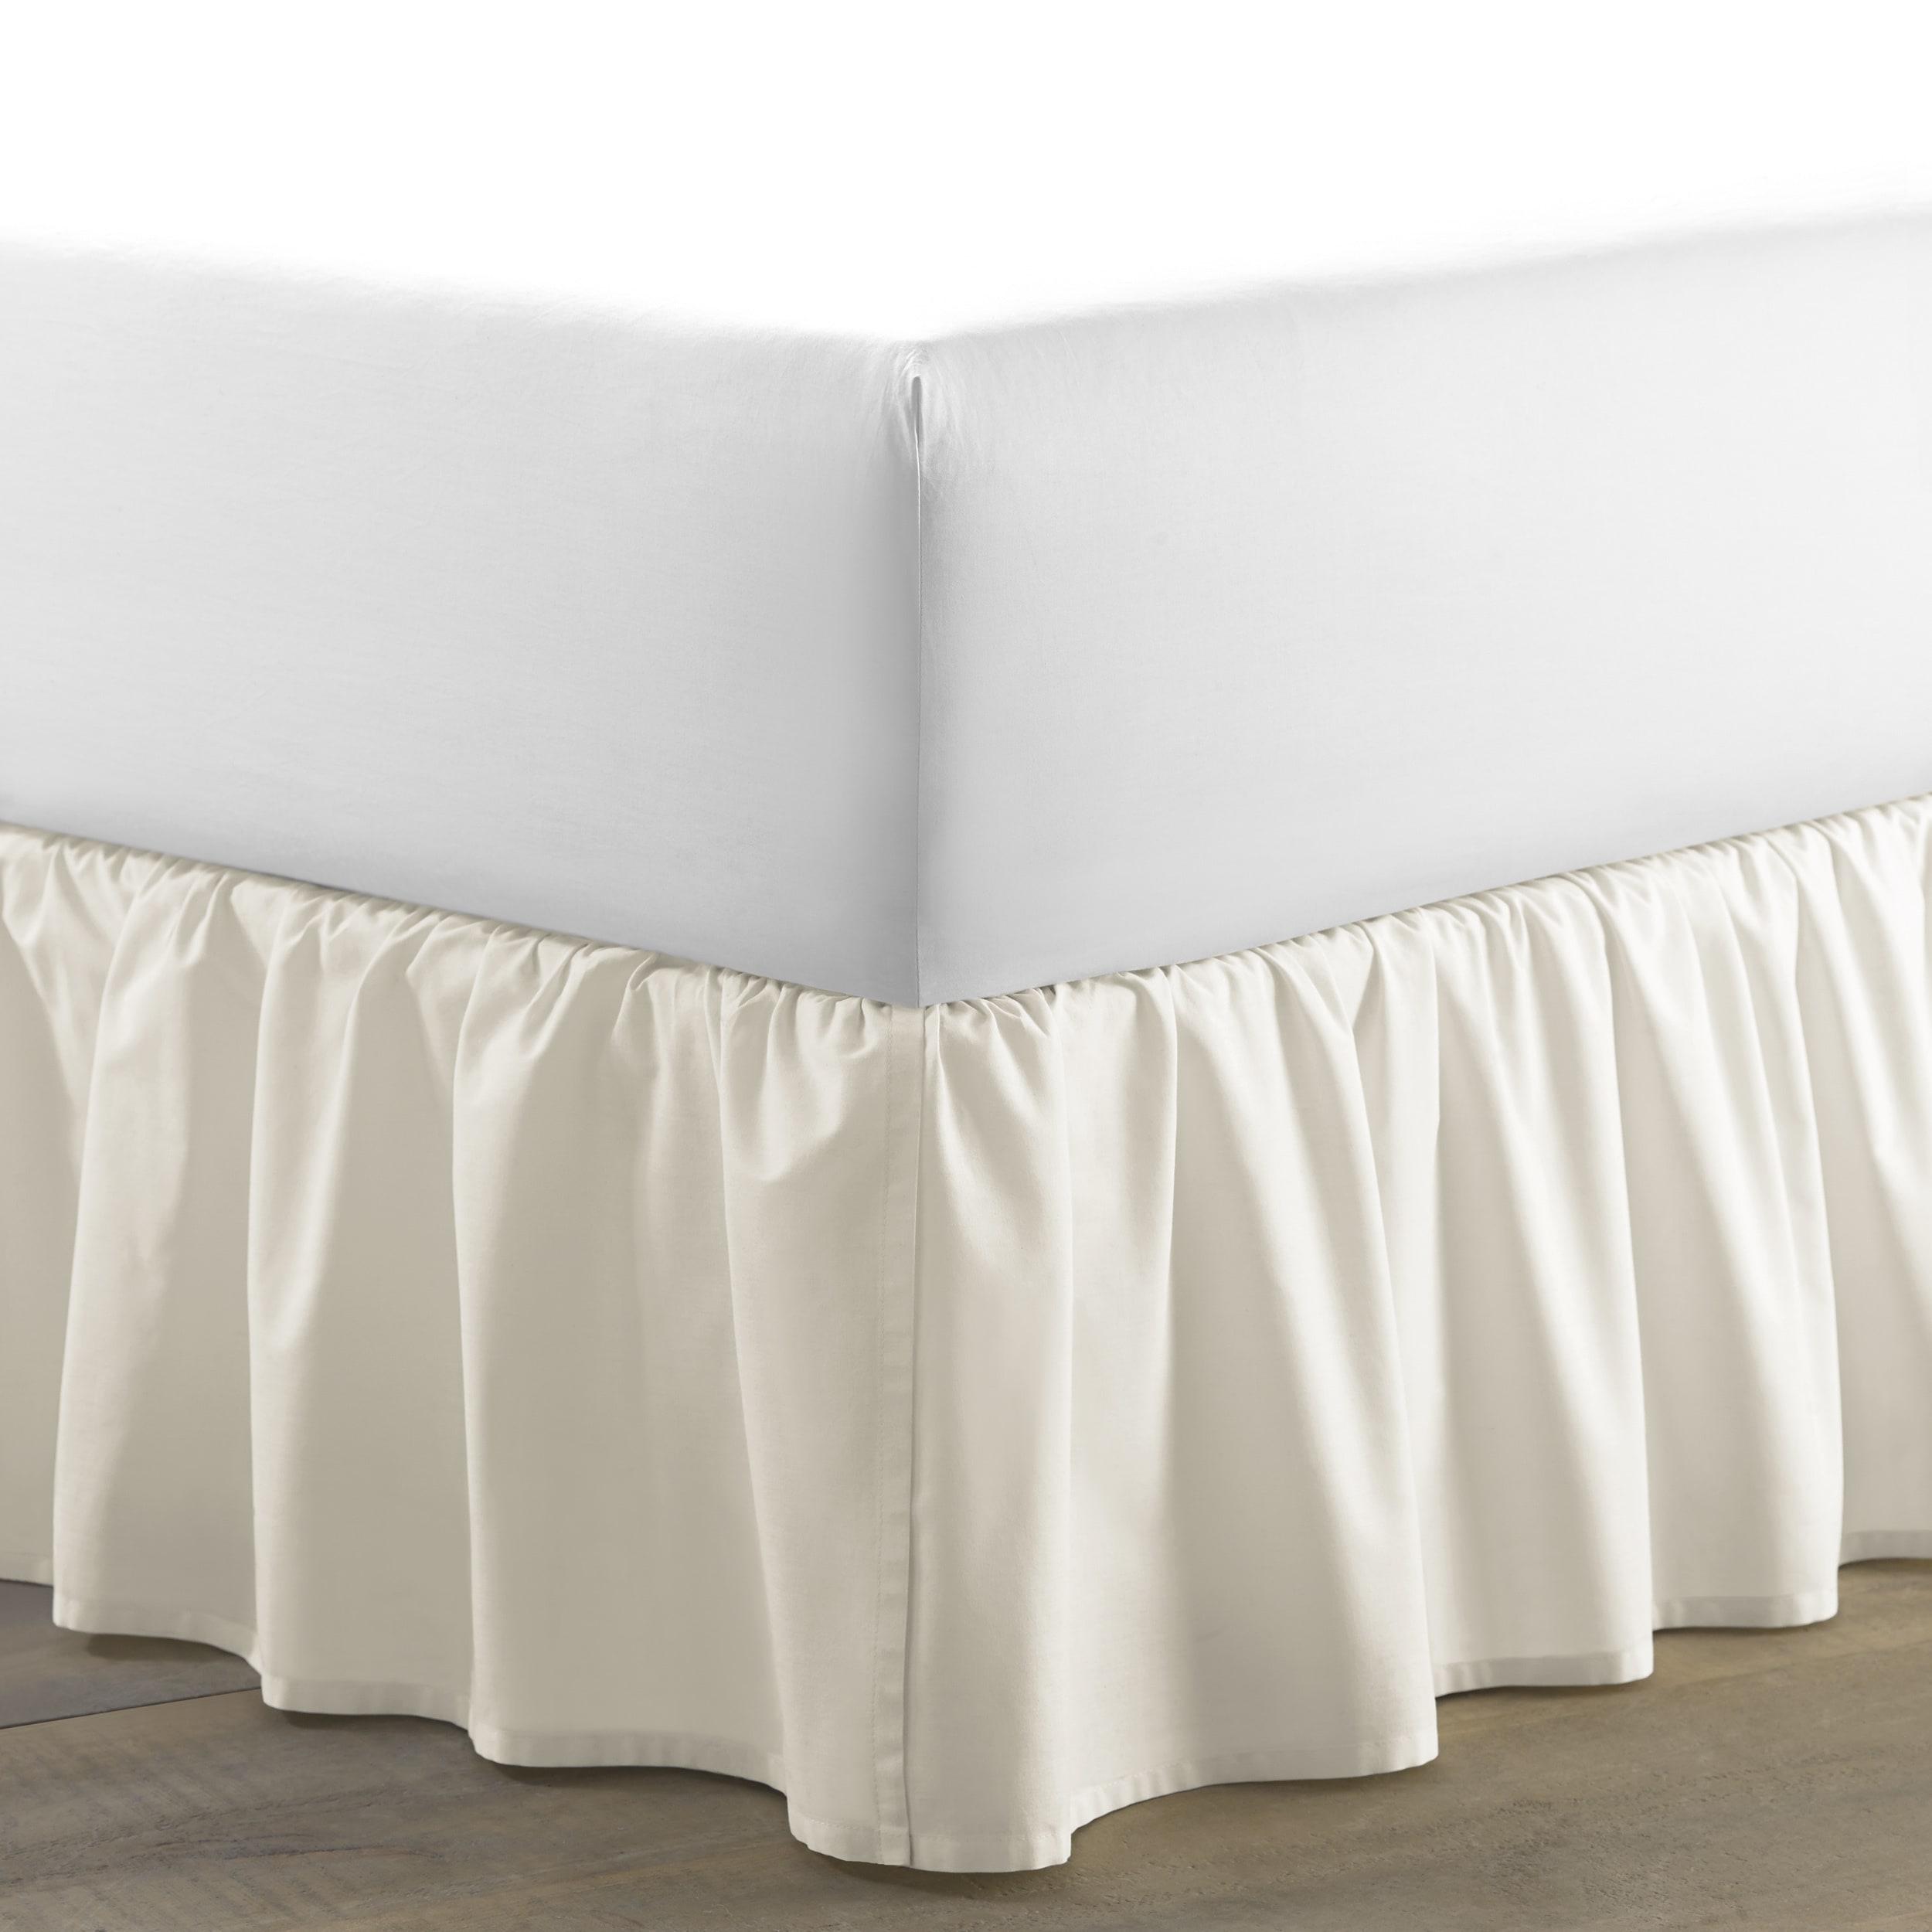 Laura Ashley Ivory Ruffled Bedskirt (Twin), Beige Off-Whi...